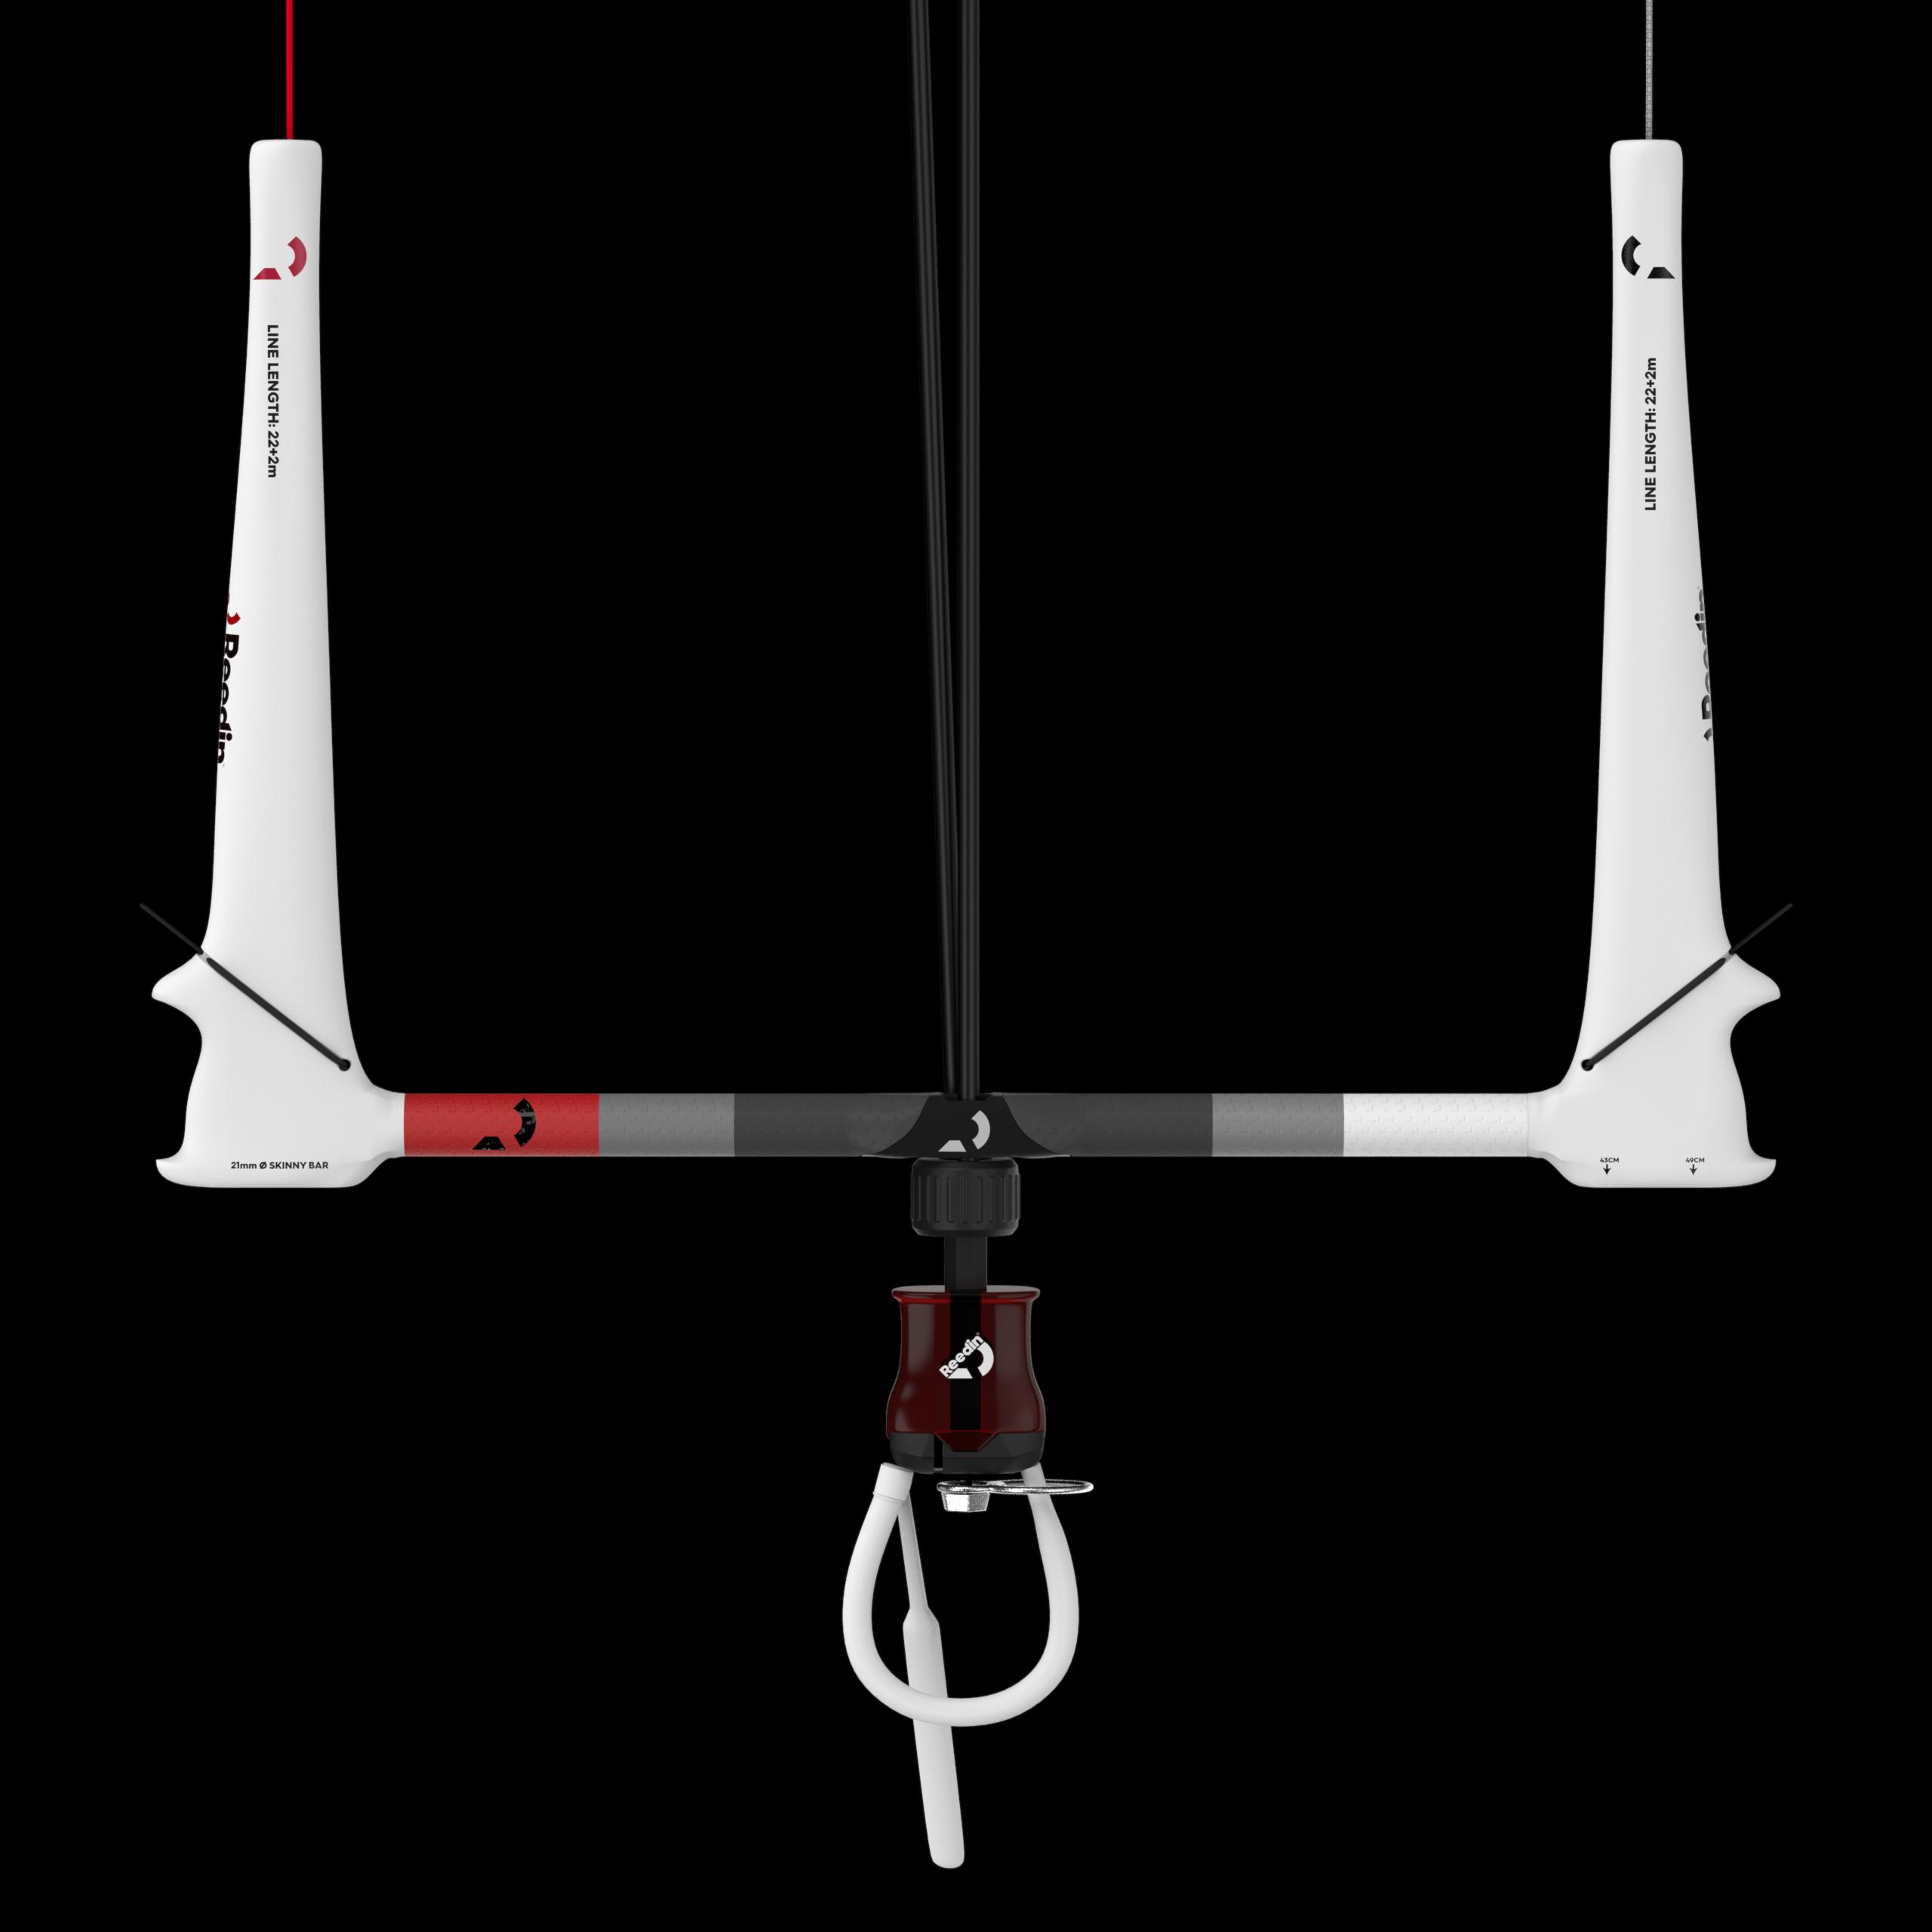 Планка управления 2021 Reedin Kites Dreamstick V2